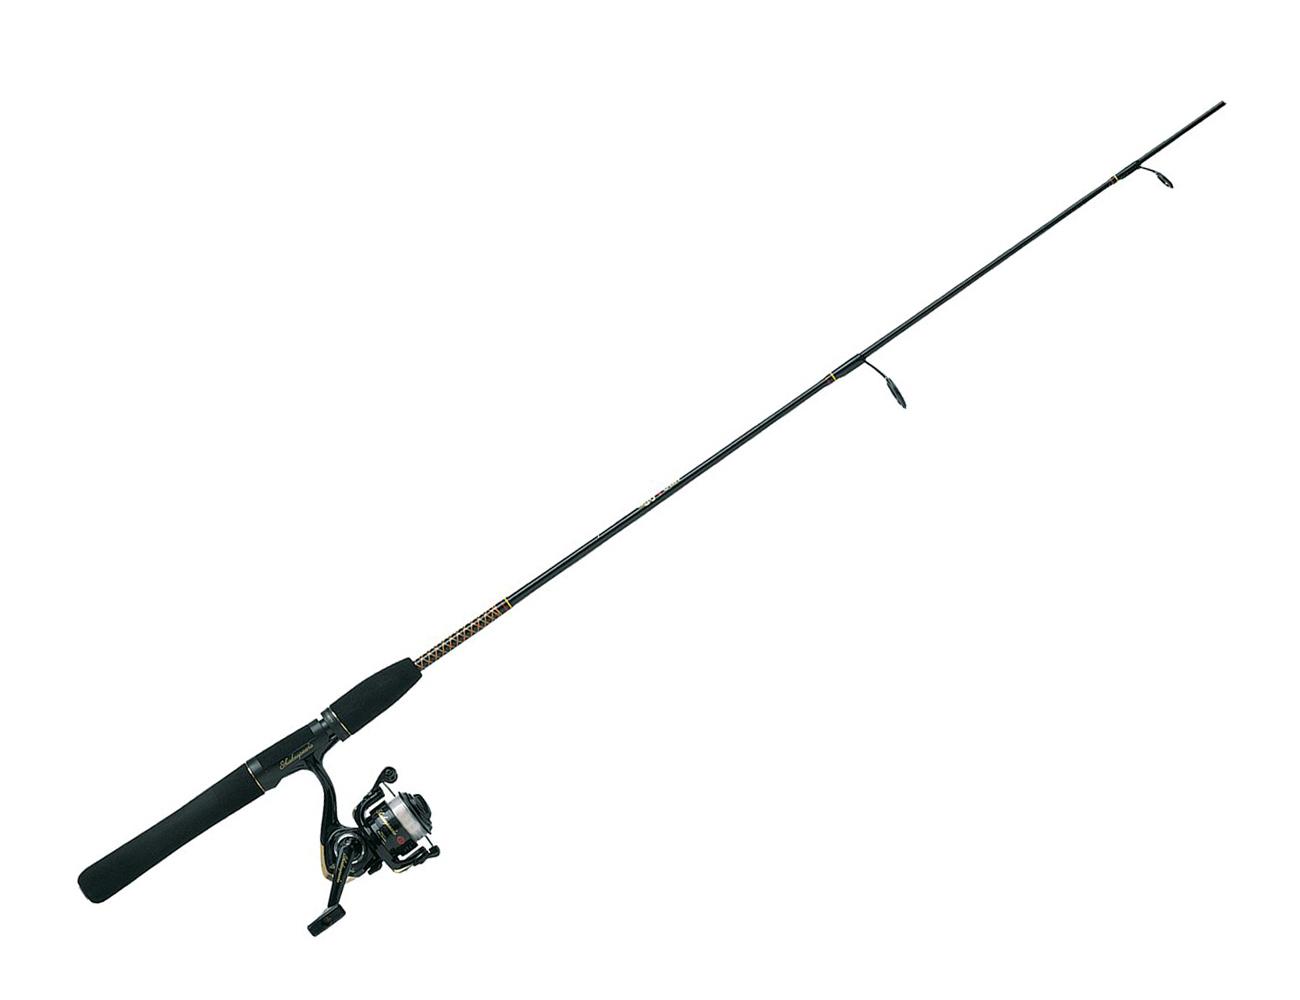 Fishing pole fishing rod clipart kiaavto-Fishing pole fishing rod clipart kiaavto 2 image-8